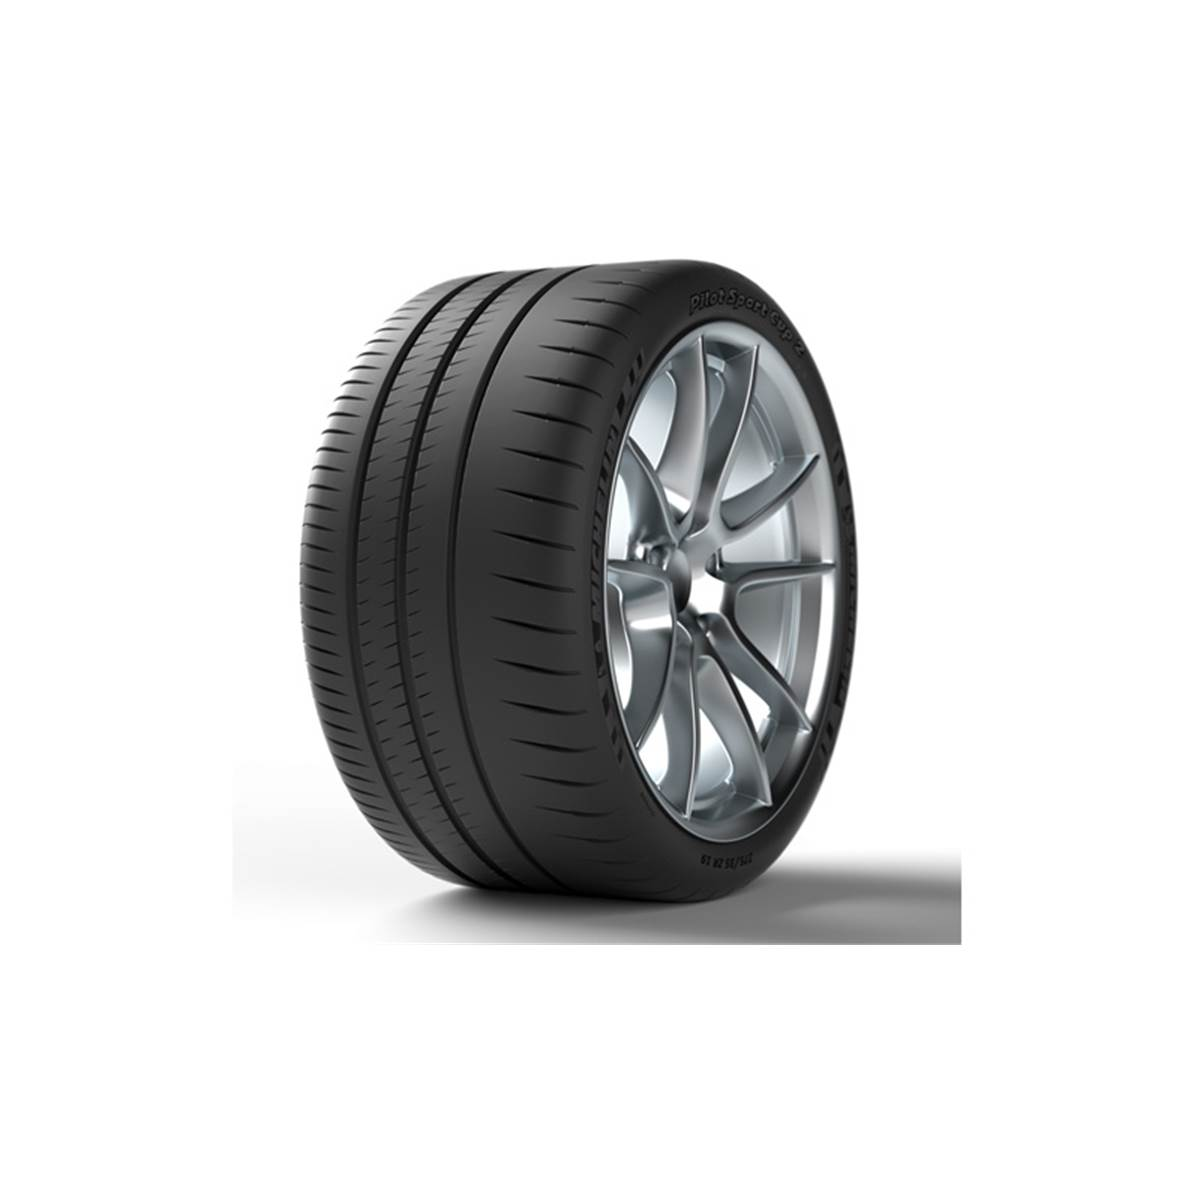 Pneu Michelin 235/40R19 96Y Pilot Sport Cup 2 XL